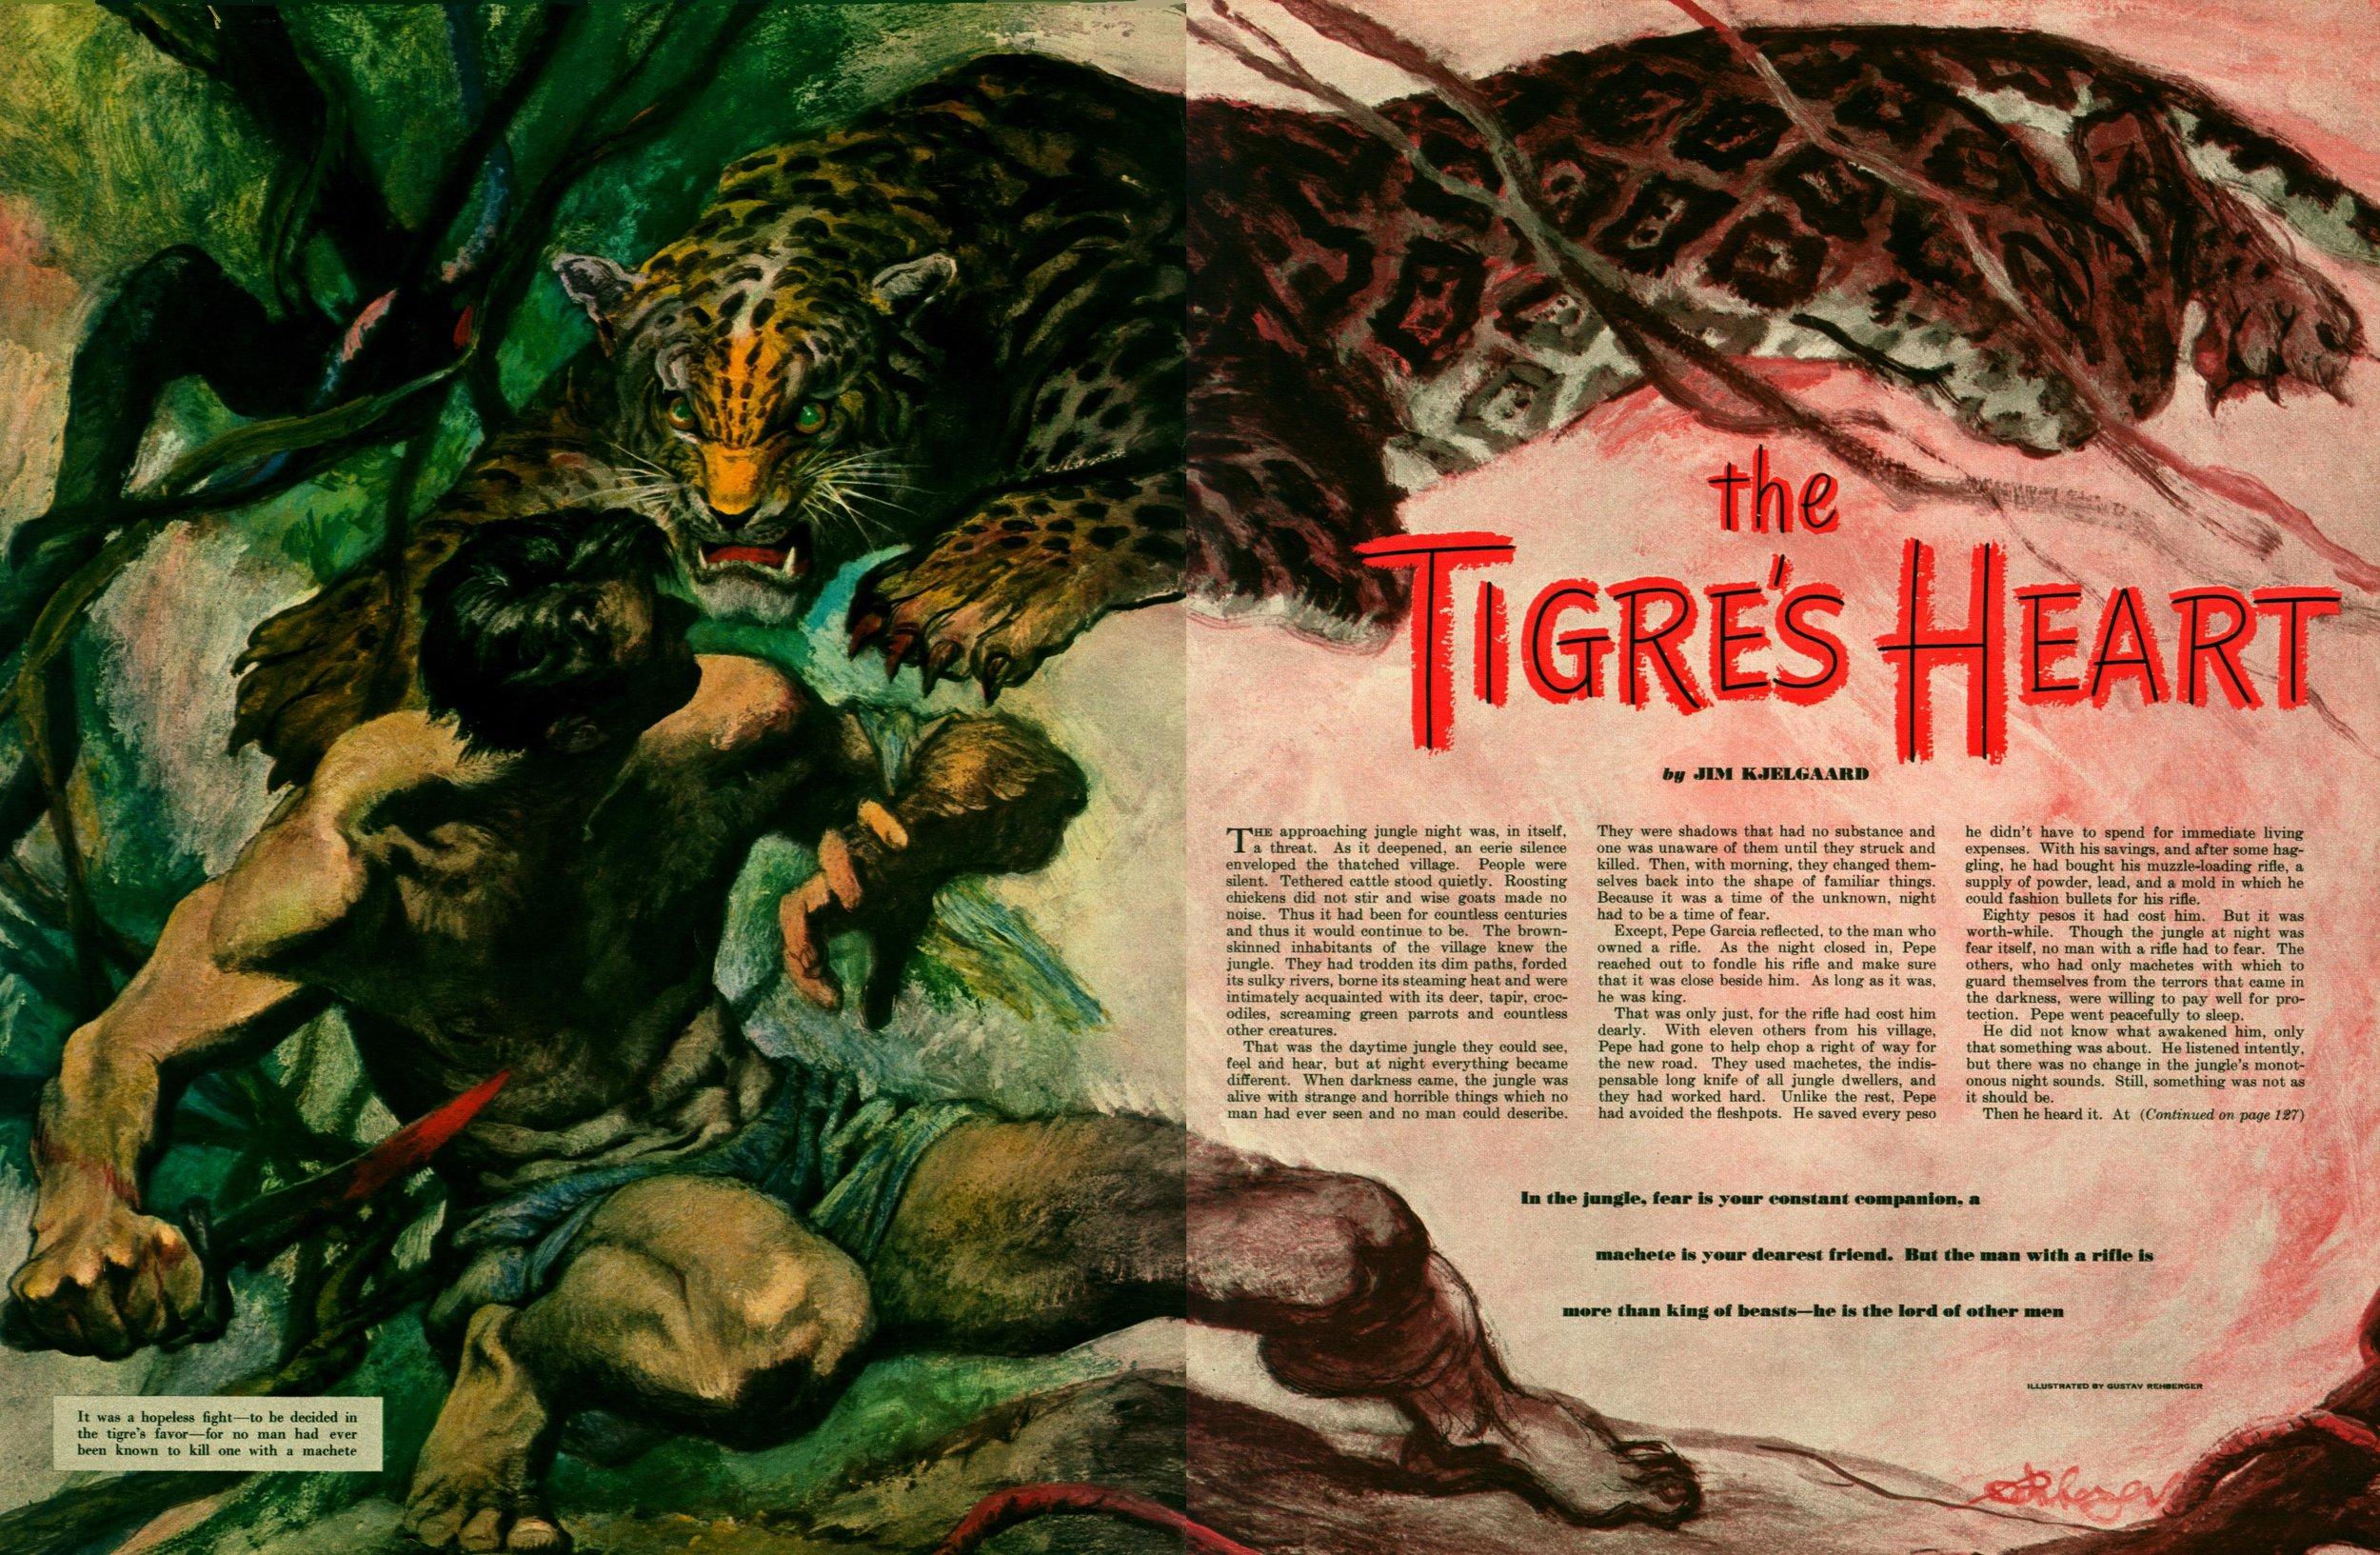 April 1951 - The Tigre's Heart